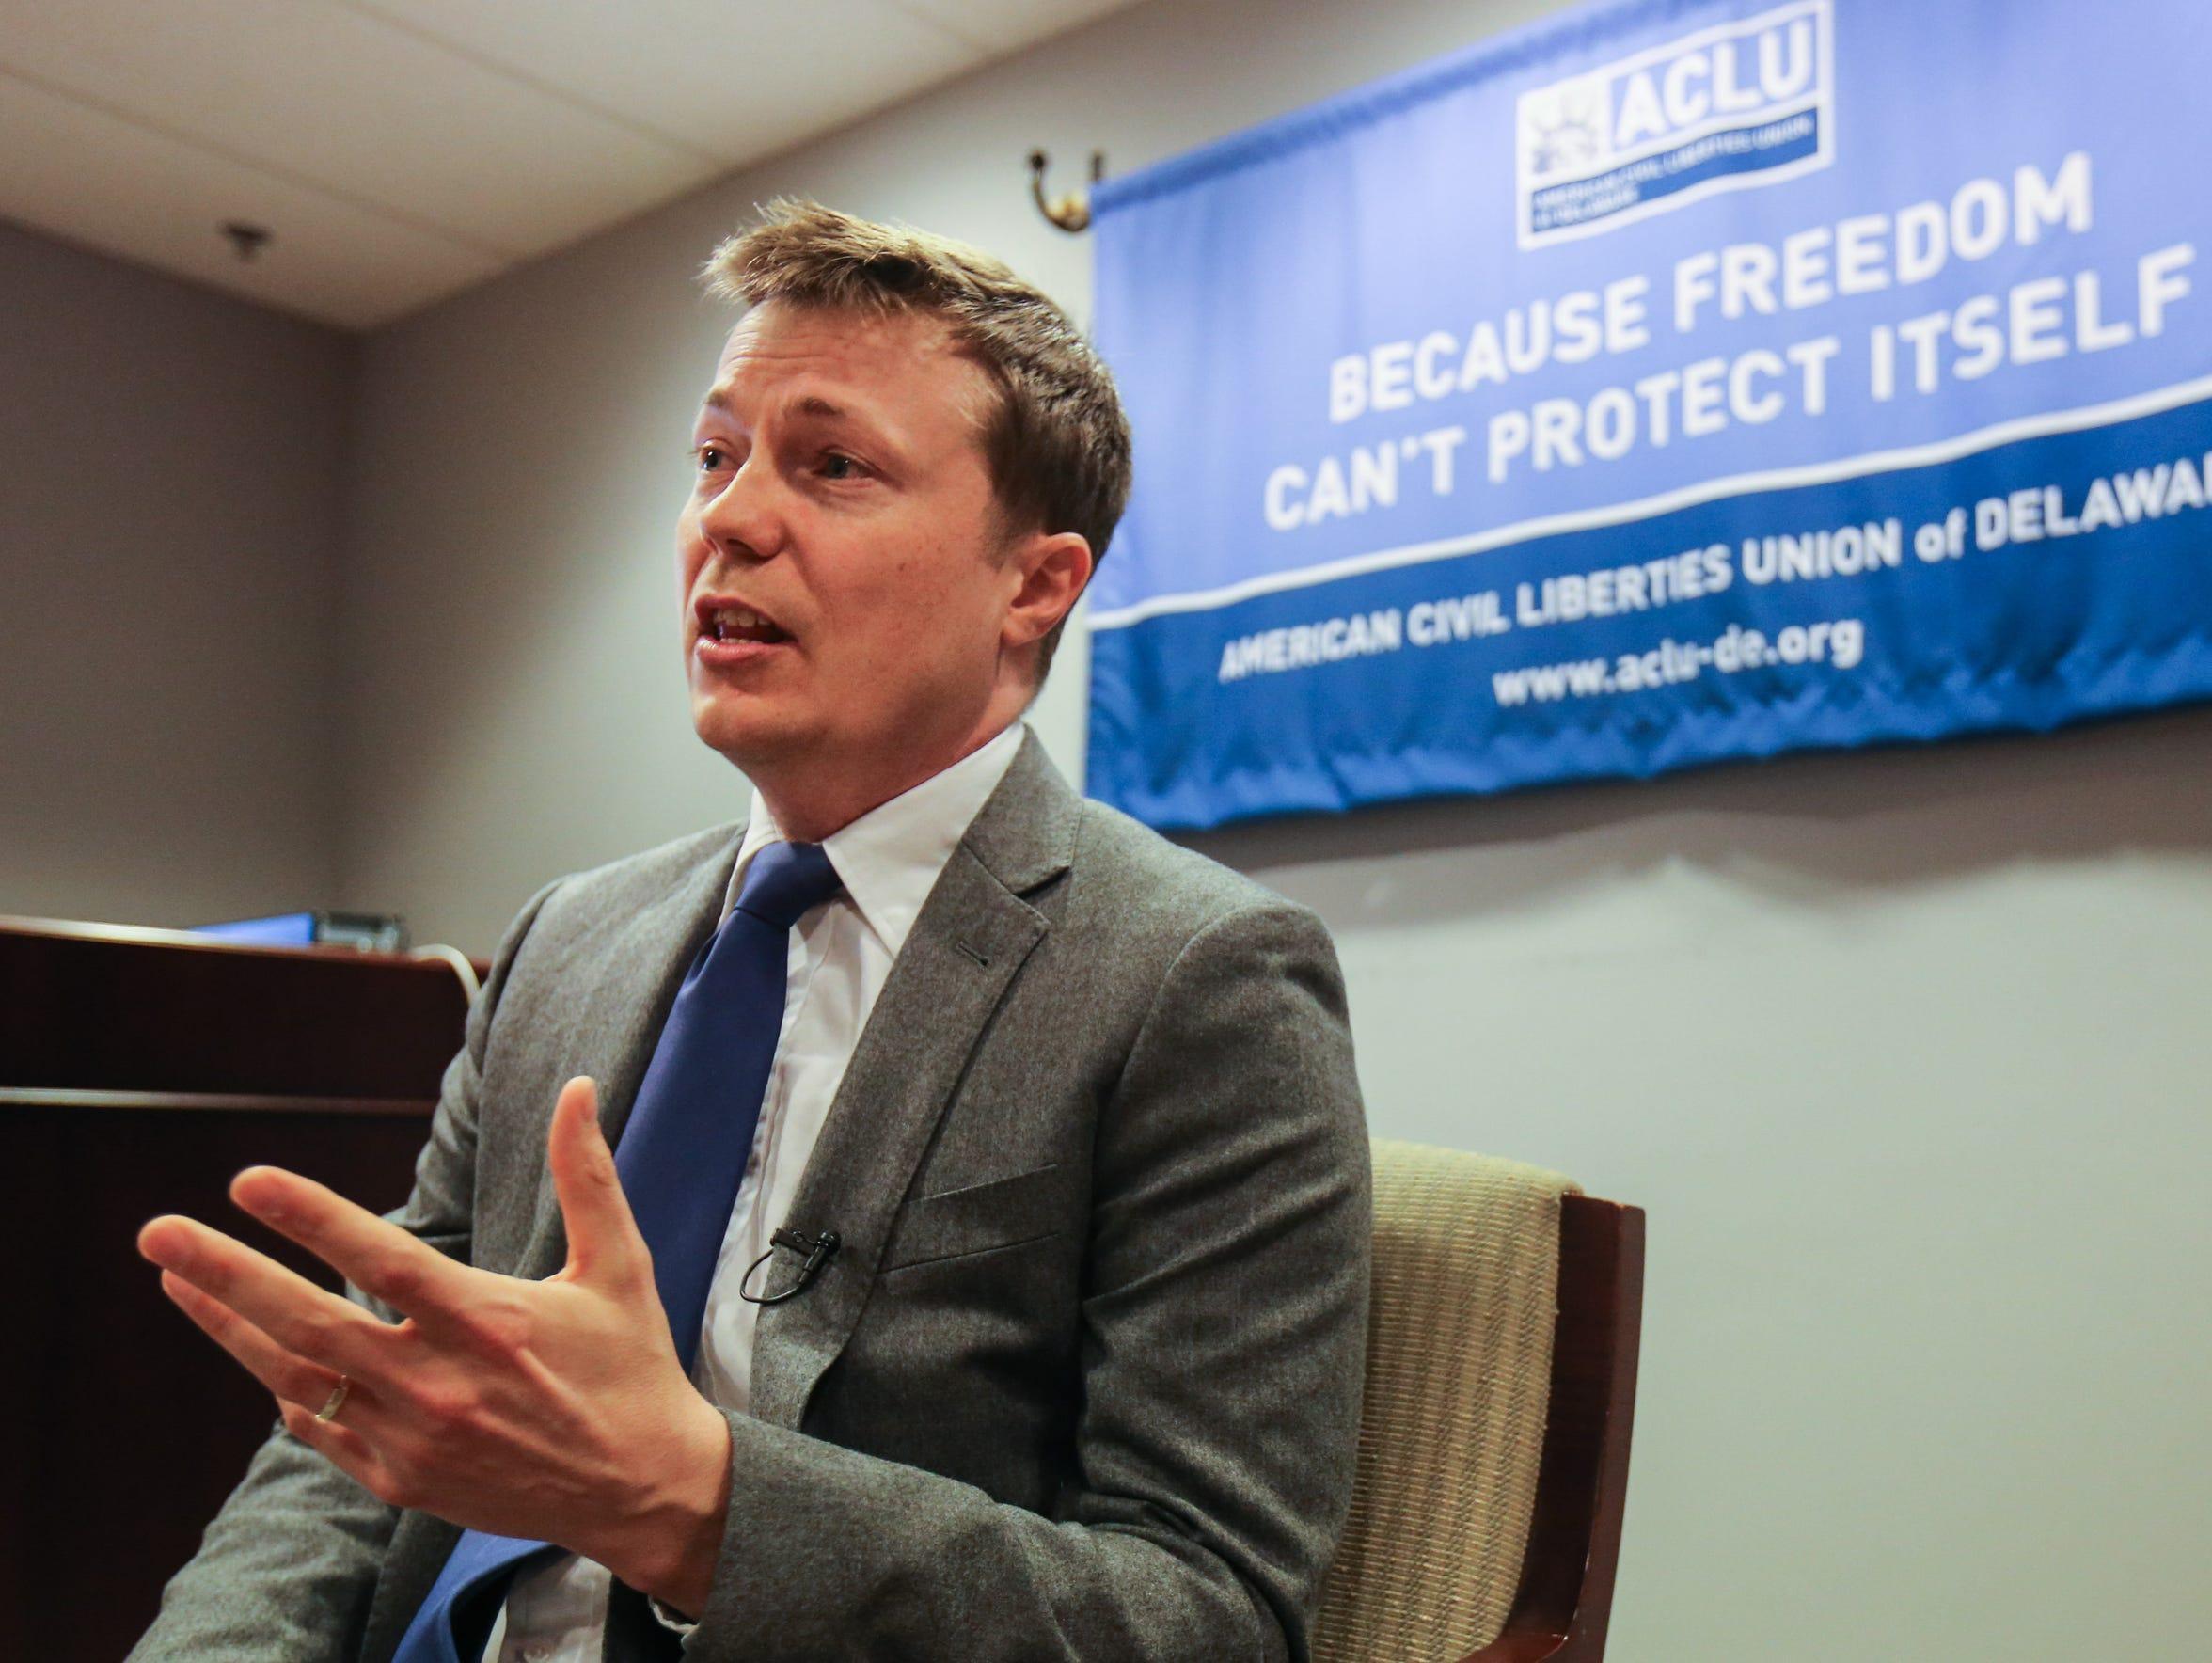 ACLU attorney Ryan Tack-Hooper